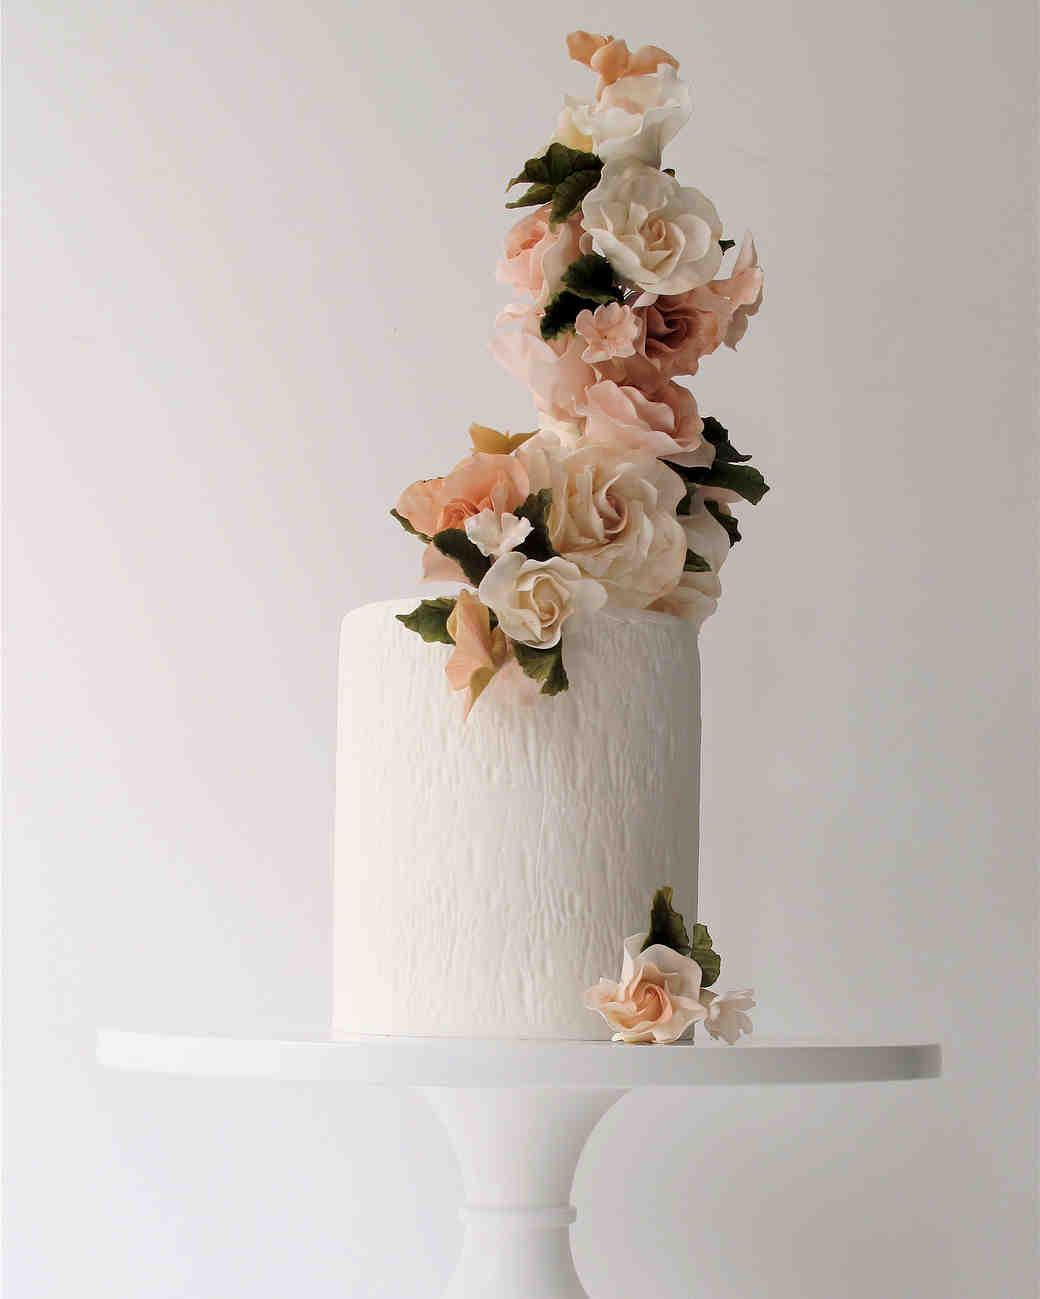 32 Pastel Wedding Cakes You Have to See | Martha Stewart Weddings